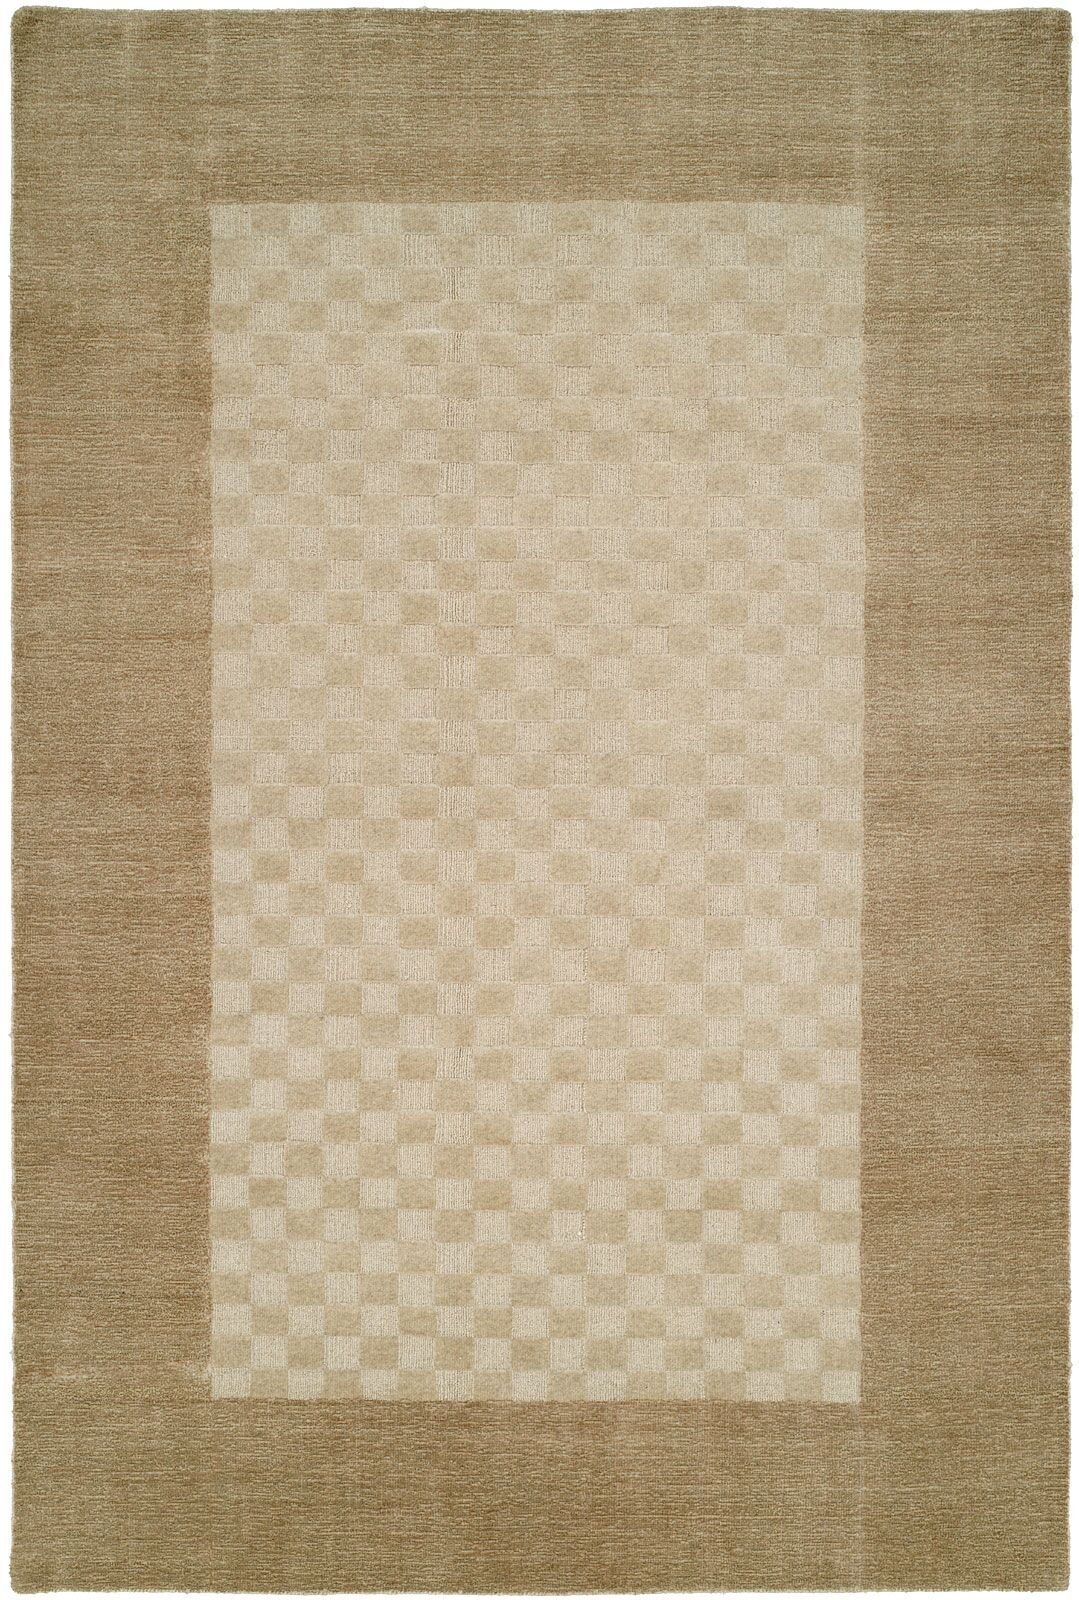 Bhakta Hand-Woven Beige Area Rug Rug Size: 3'6